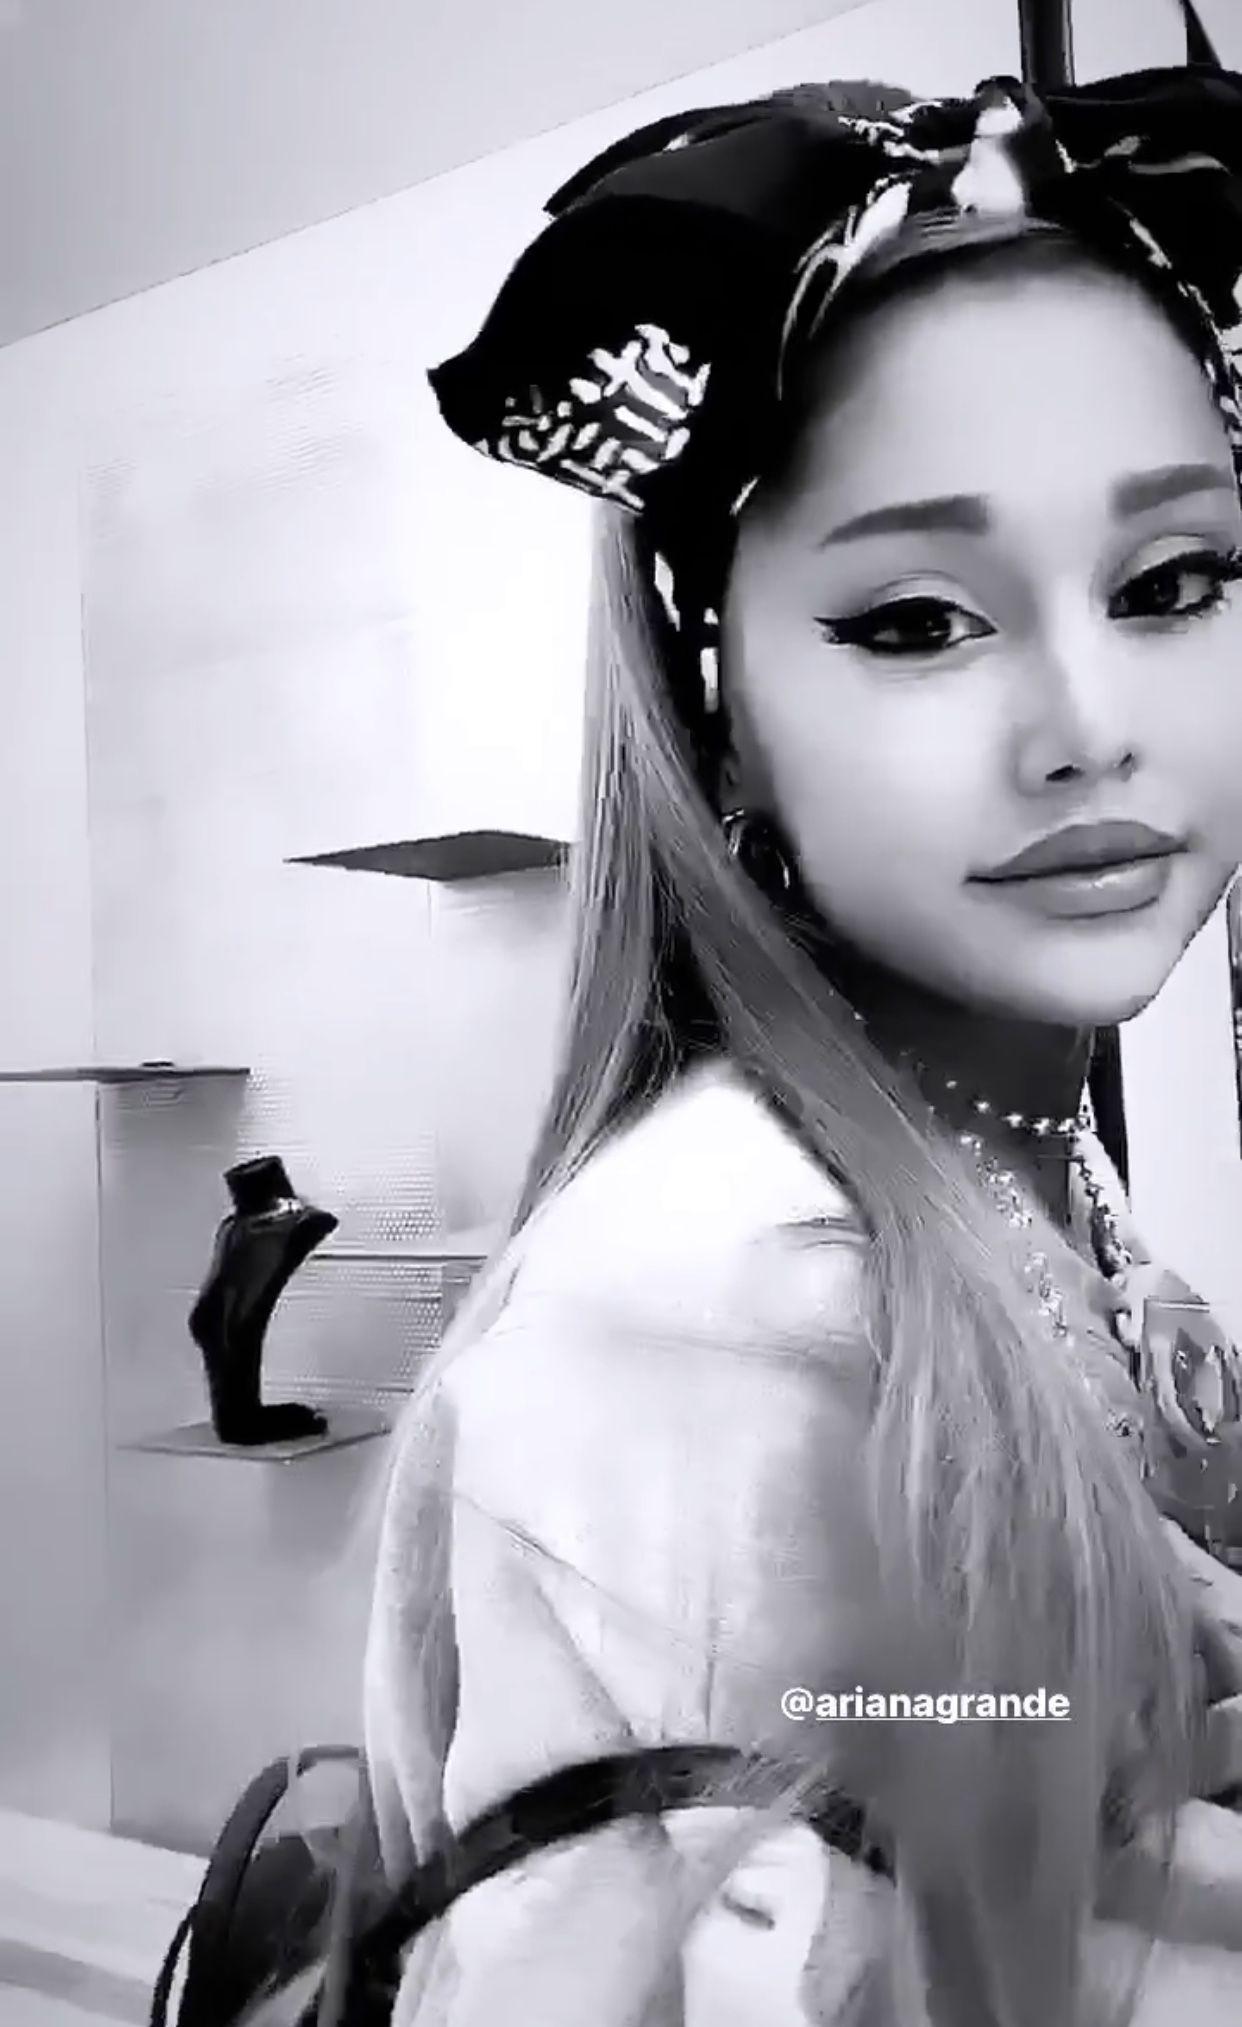 arianagrande in 2020 Ariana instagram, Ariana grande